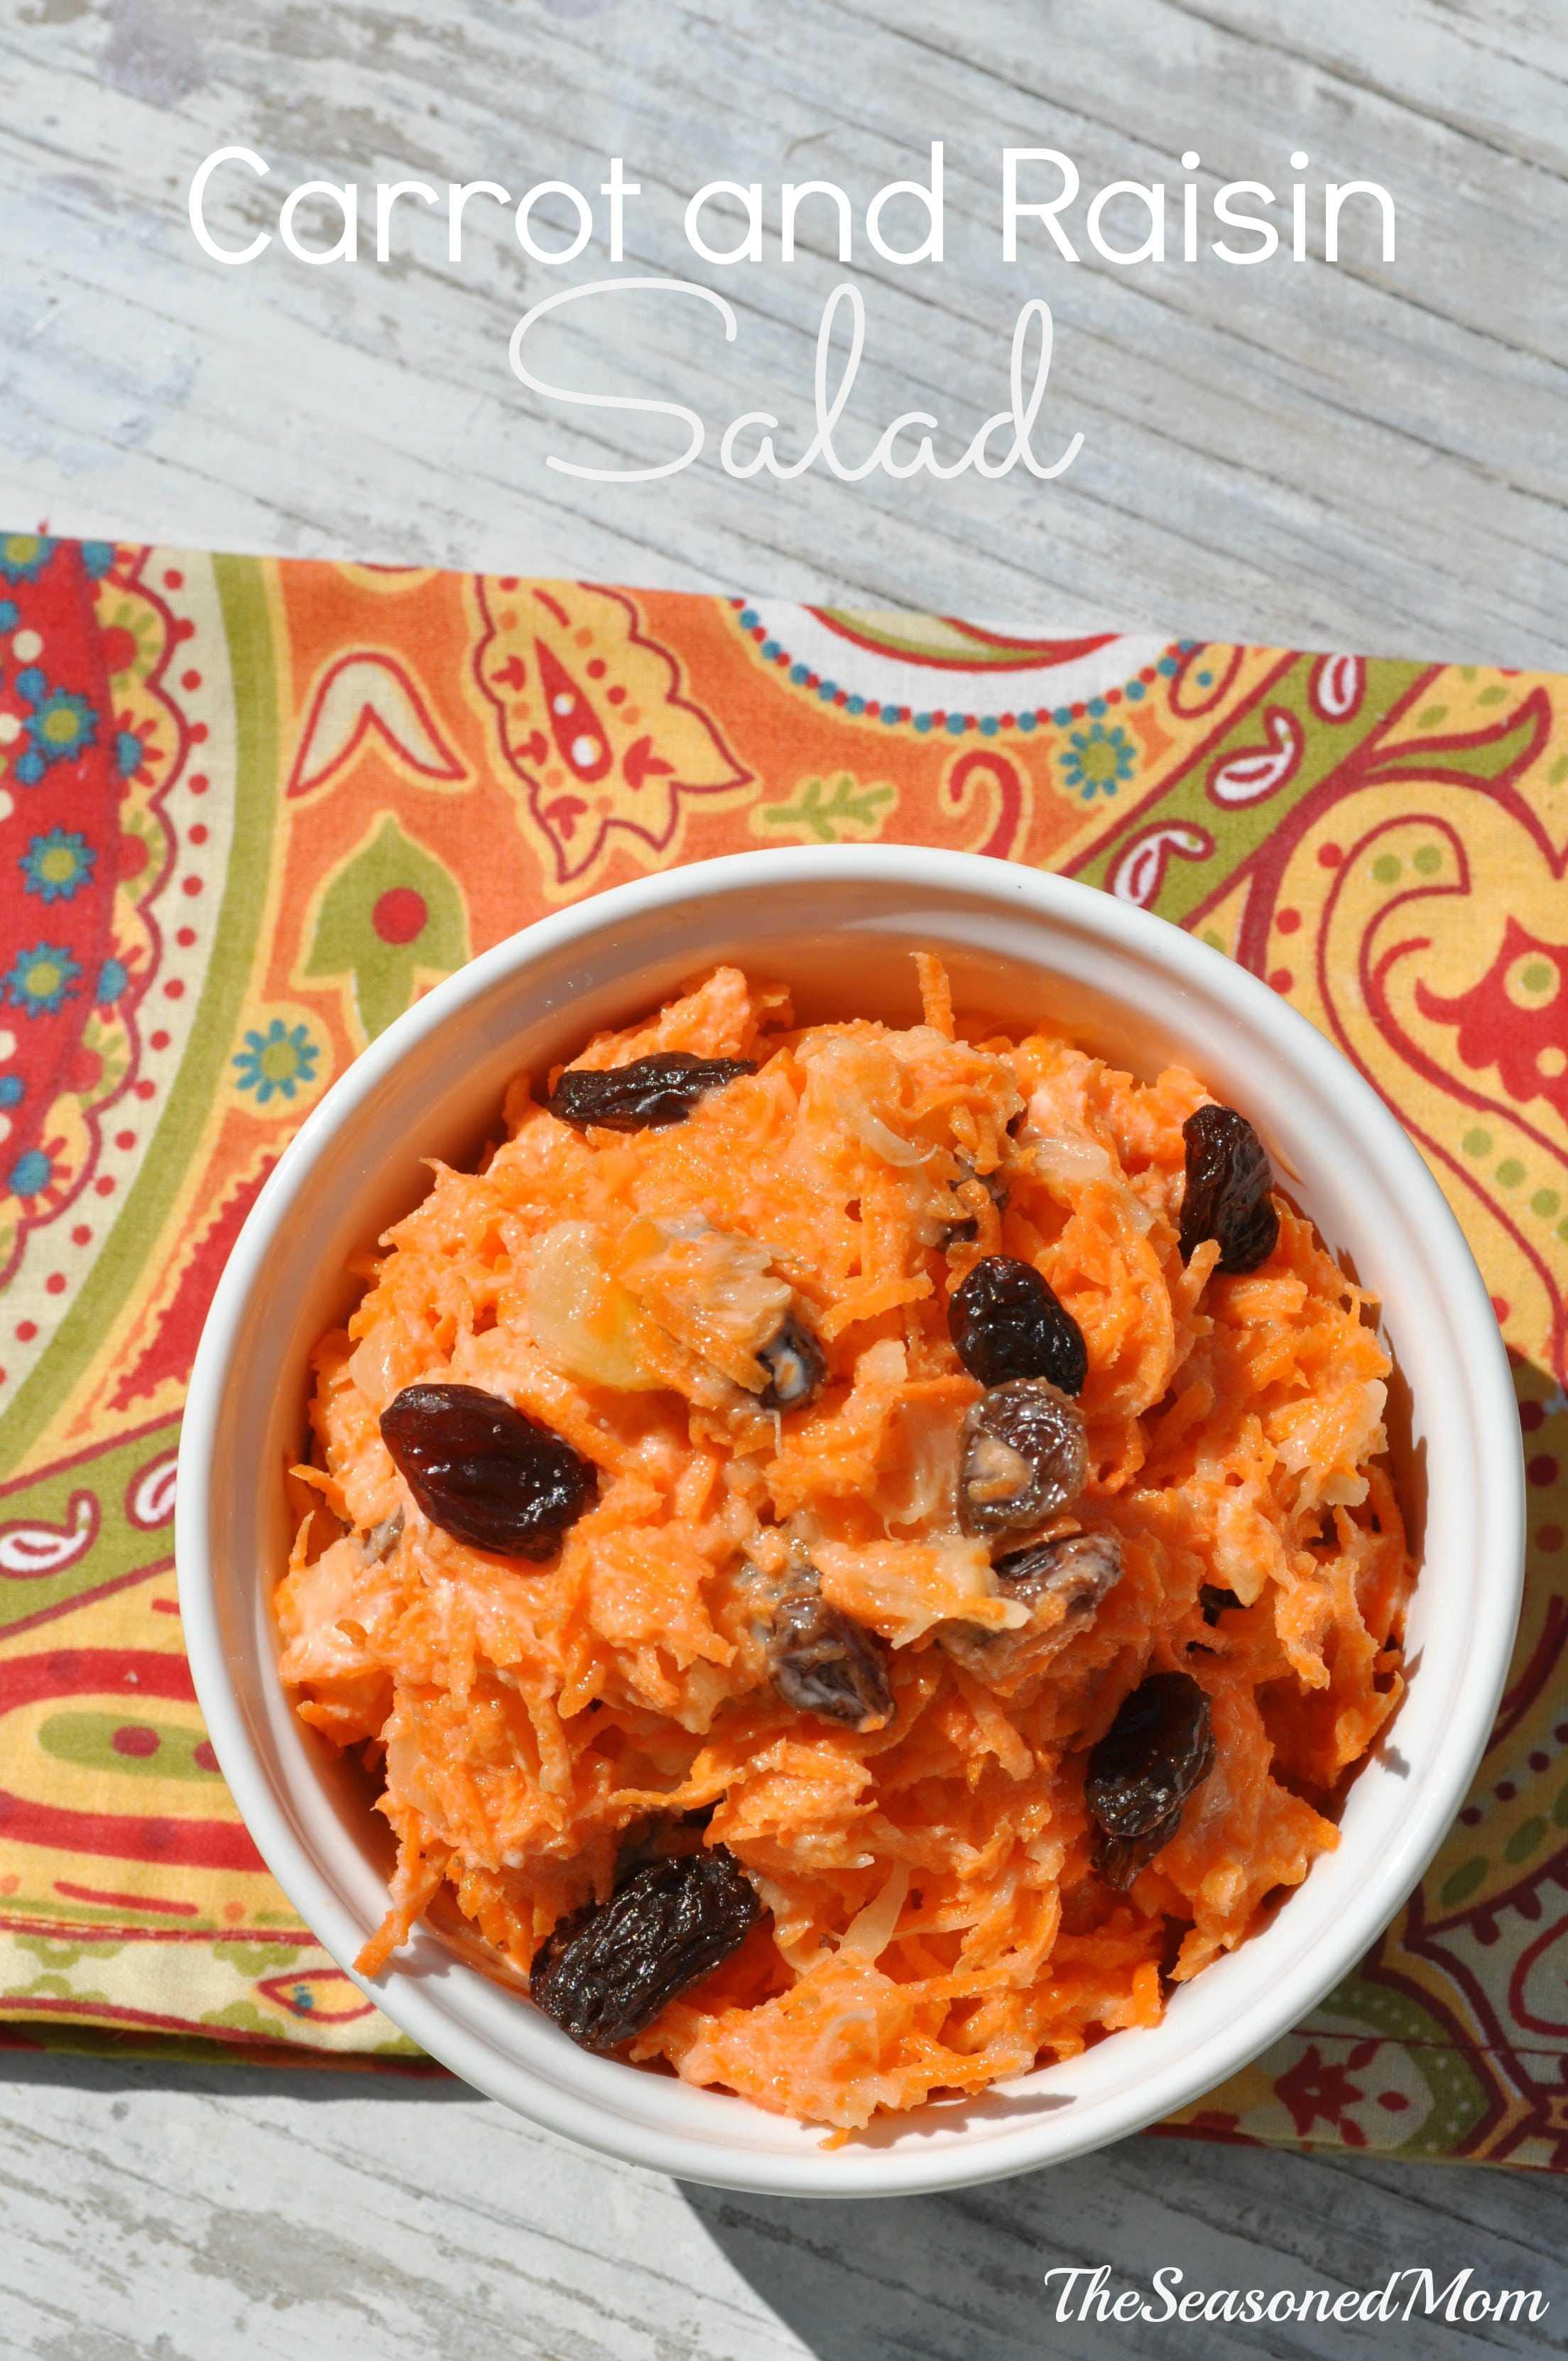 Carrot and Raisin Salad